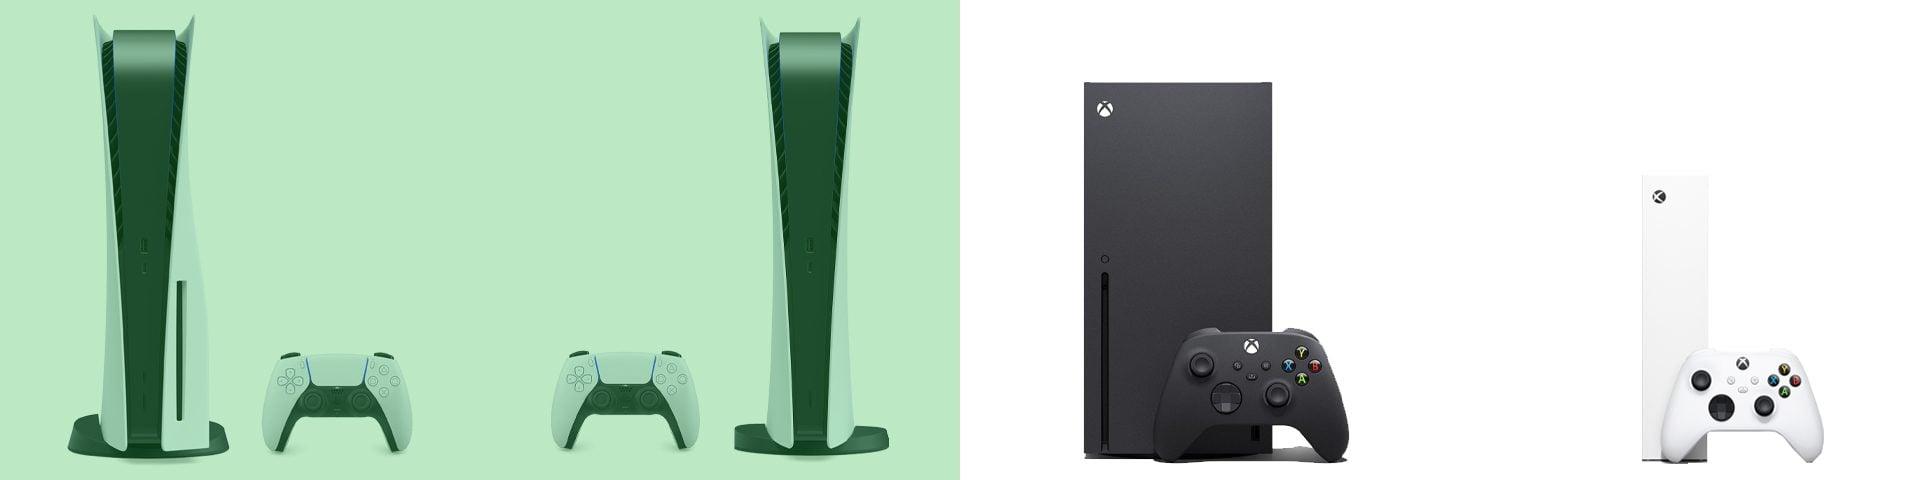 Comparatif Next-Gen